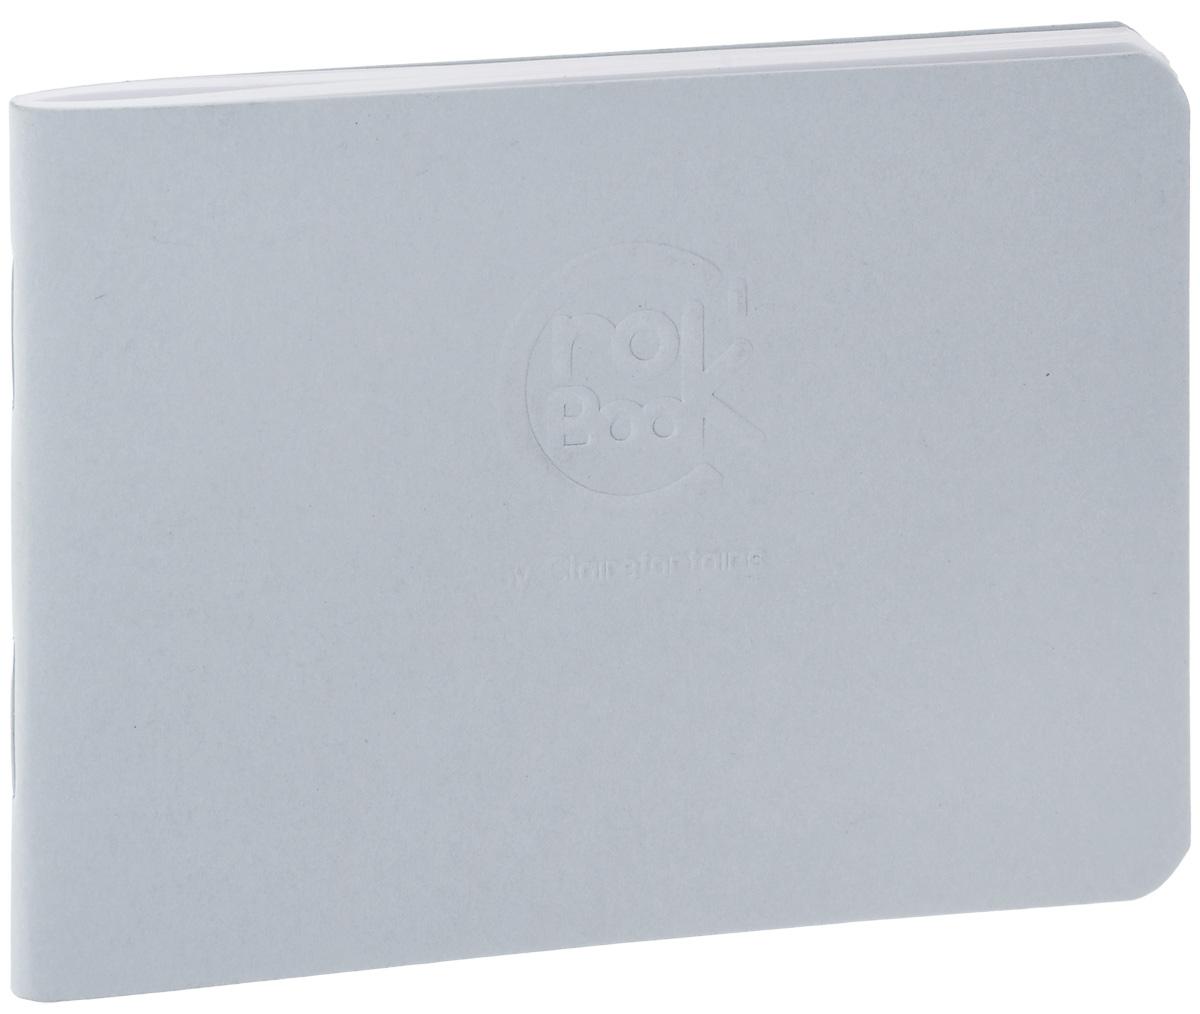 Блокнот Clairefontaine Crok Book, цвет: серый, формат A7, 24 листа2 006000 115940Блокнот Clairefontaine Crok Book, цвет: серый, формат A7, 24 листа